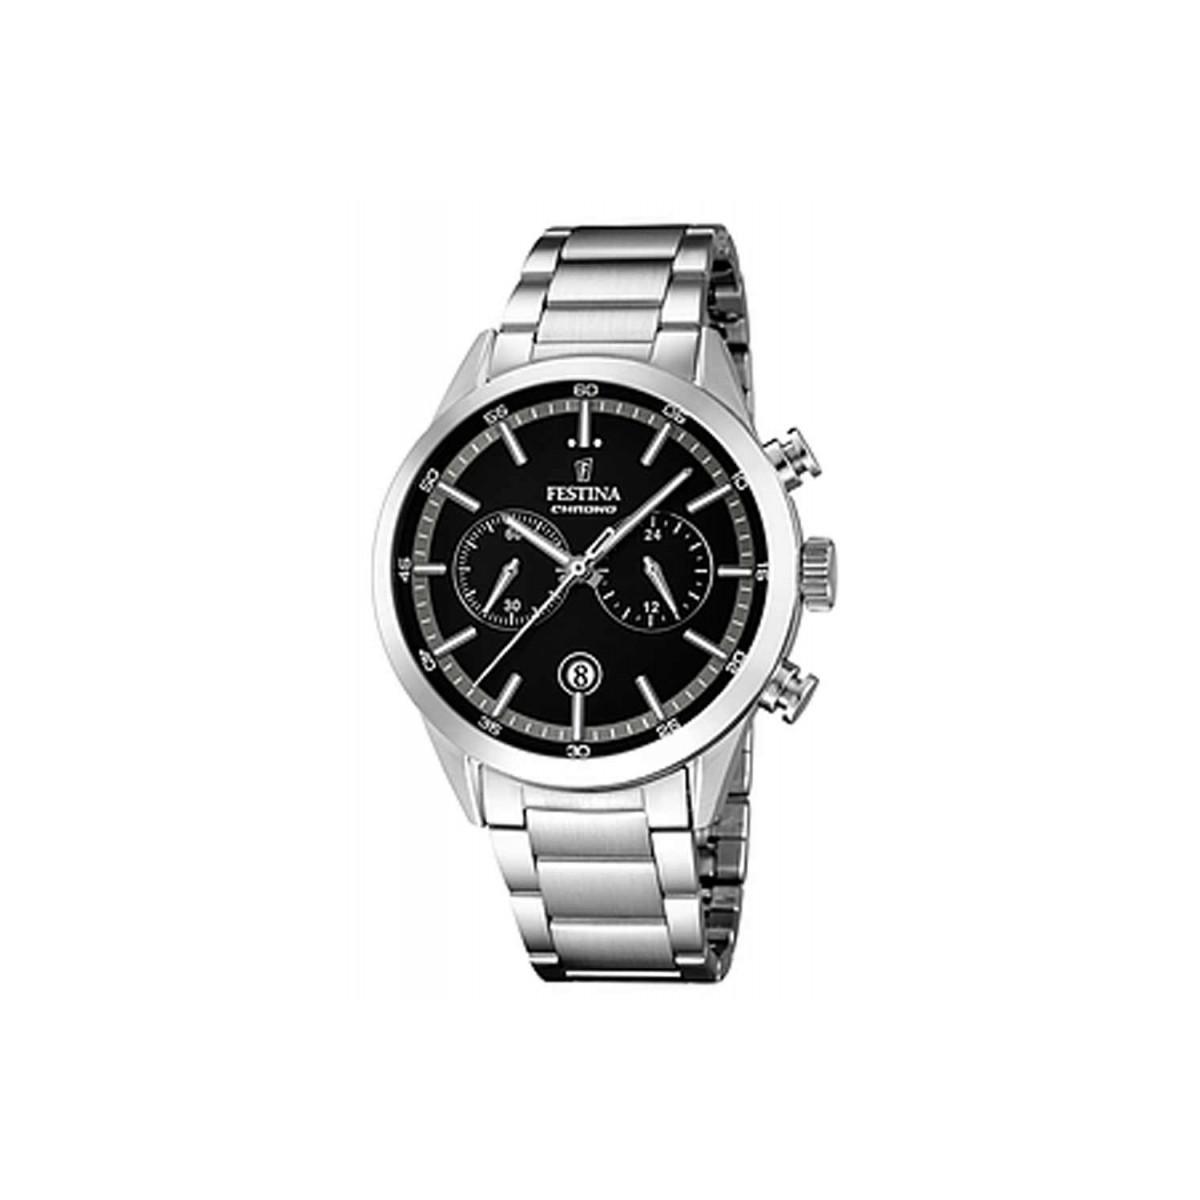 https://www.gaberjoyeria.com/3331-thickbox_default/reloj-festina-f16826-3.jpg